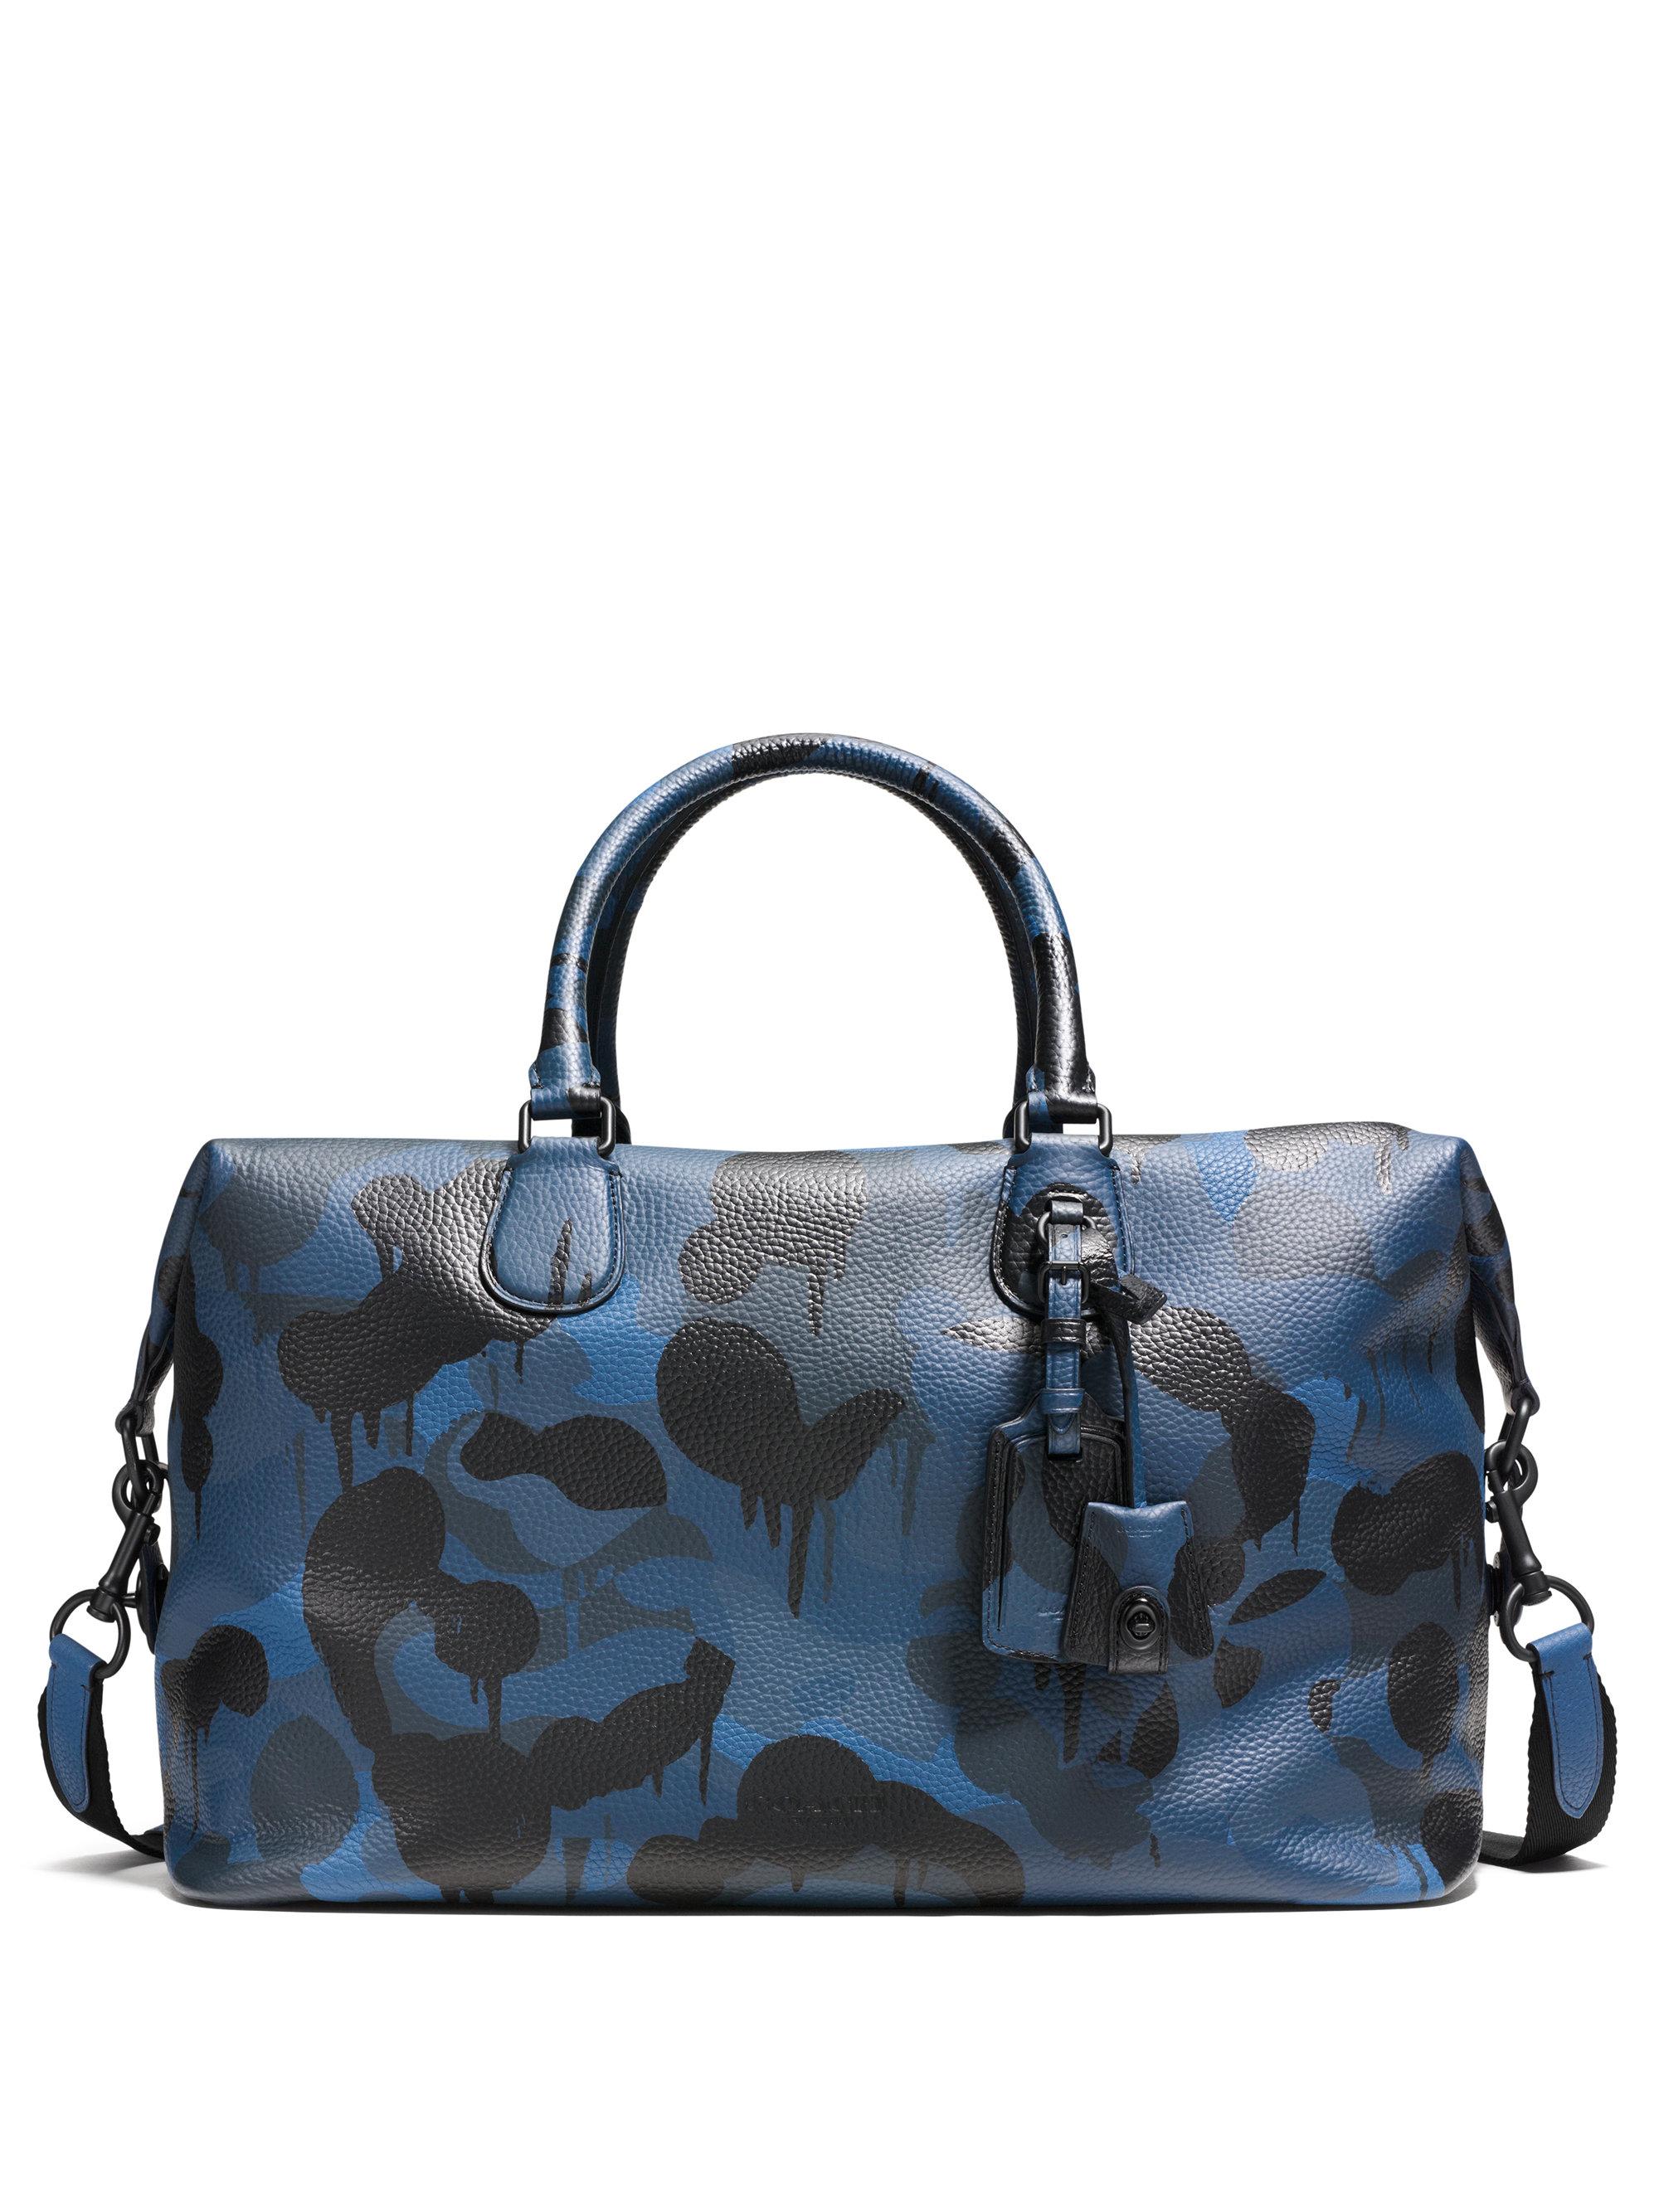 713d995f8c Lyst - COACH Explorer Camo-print Leather Duffle Bag in Blue